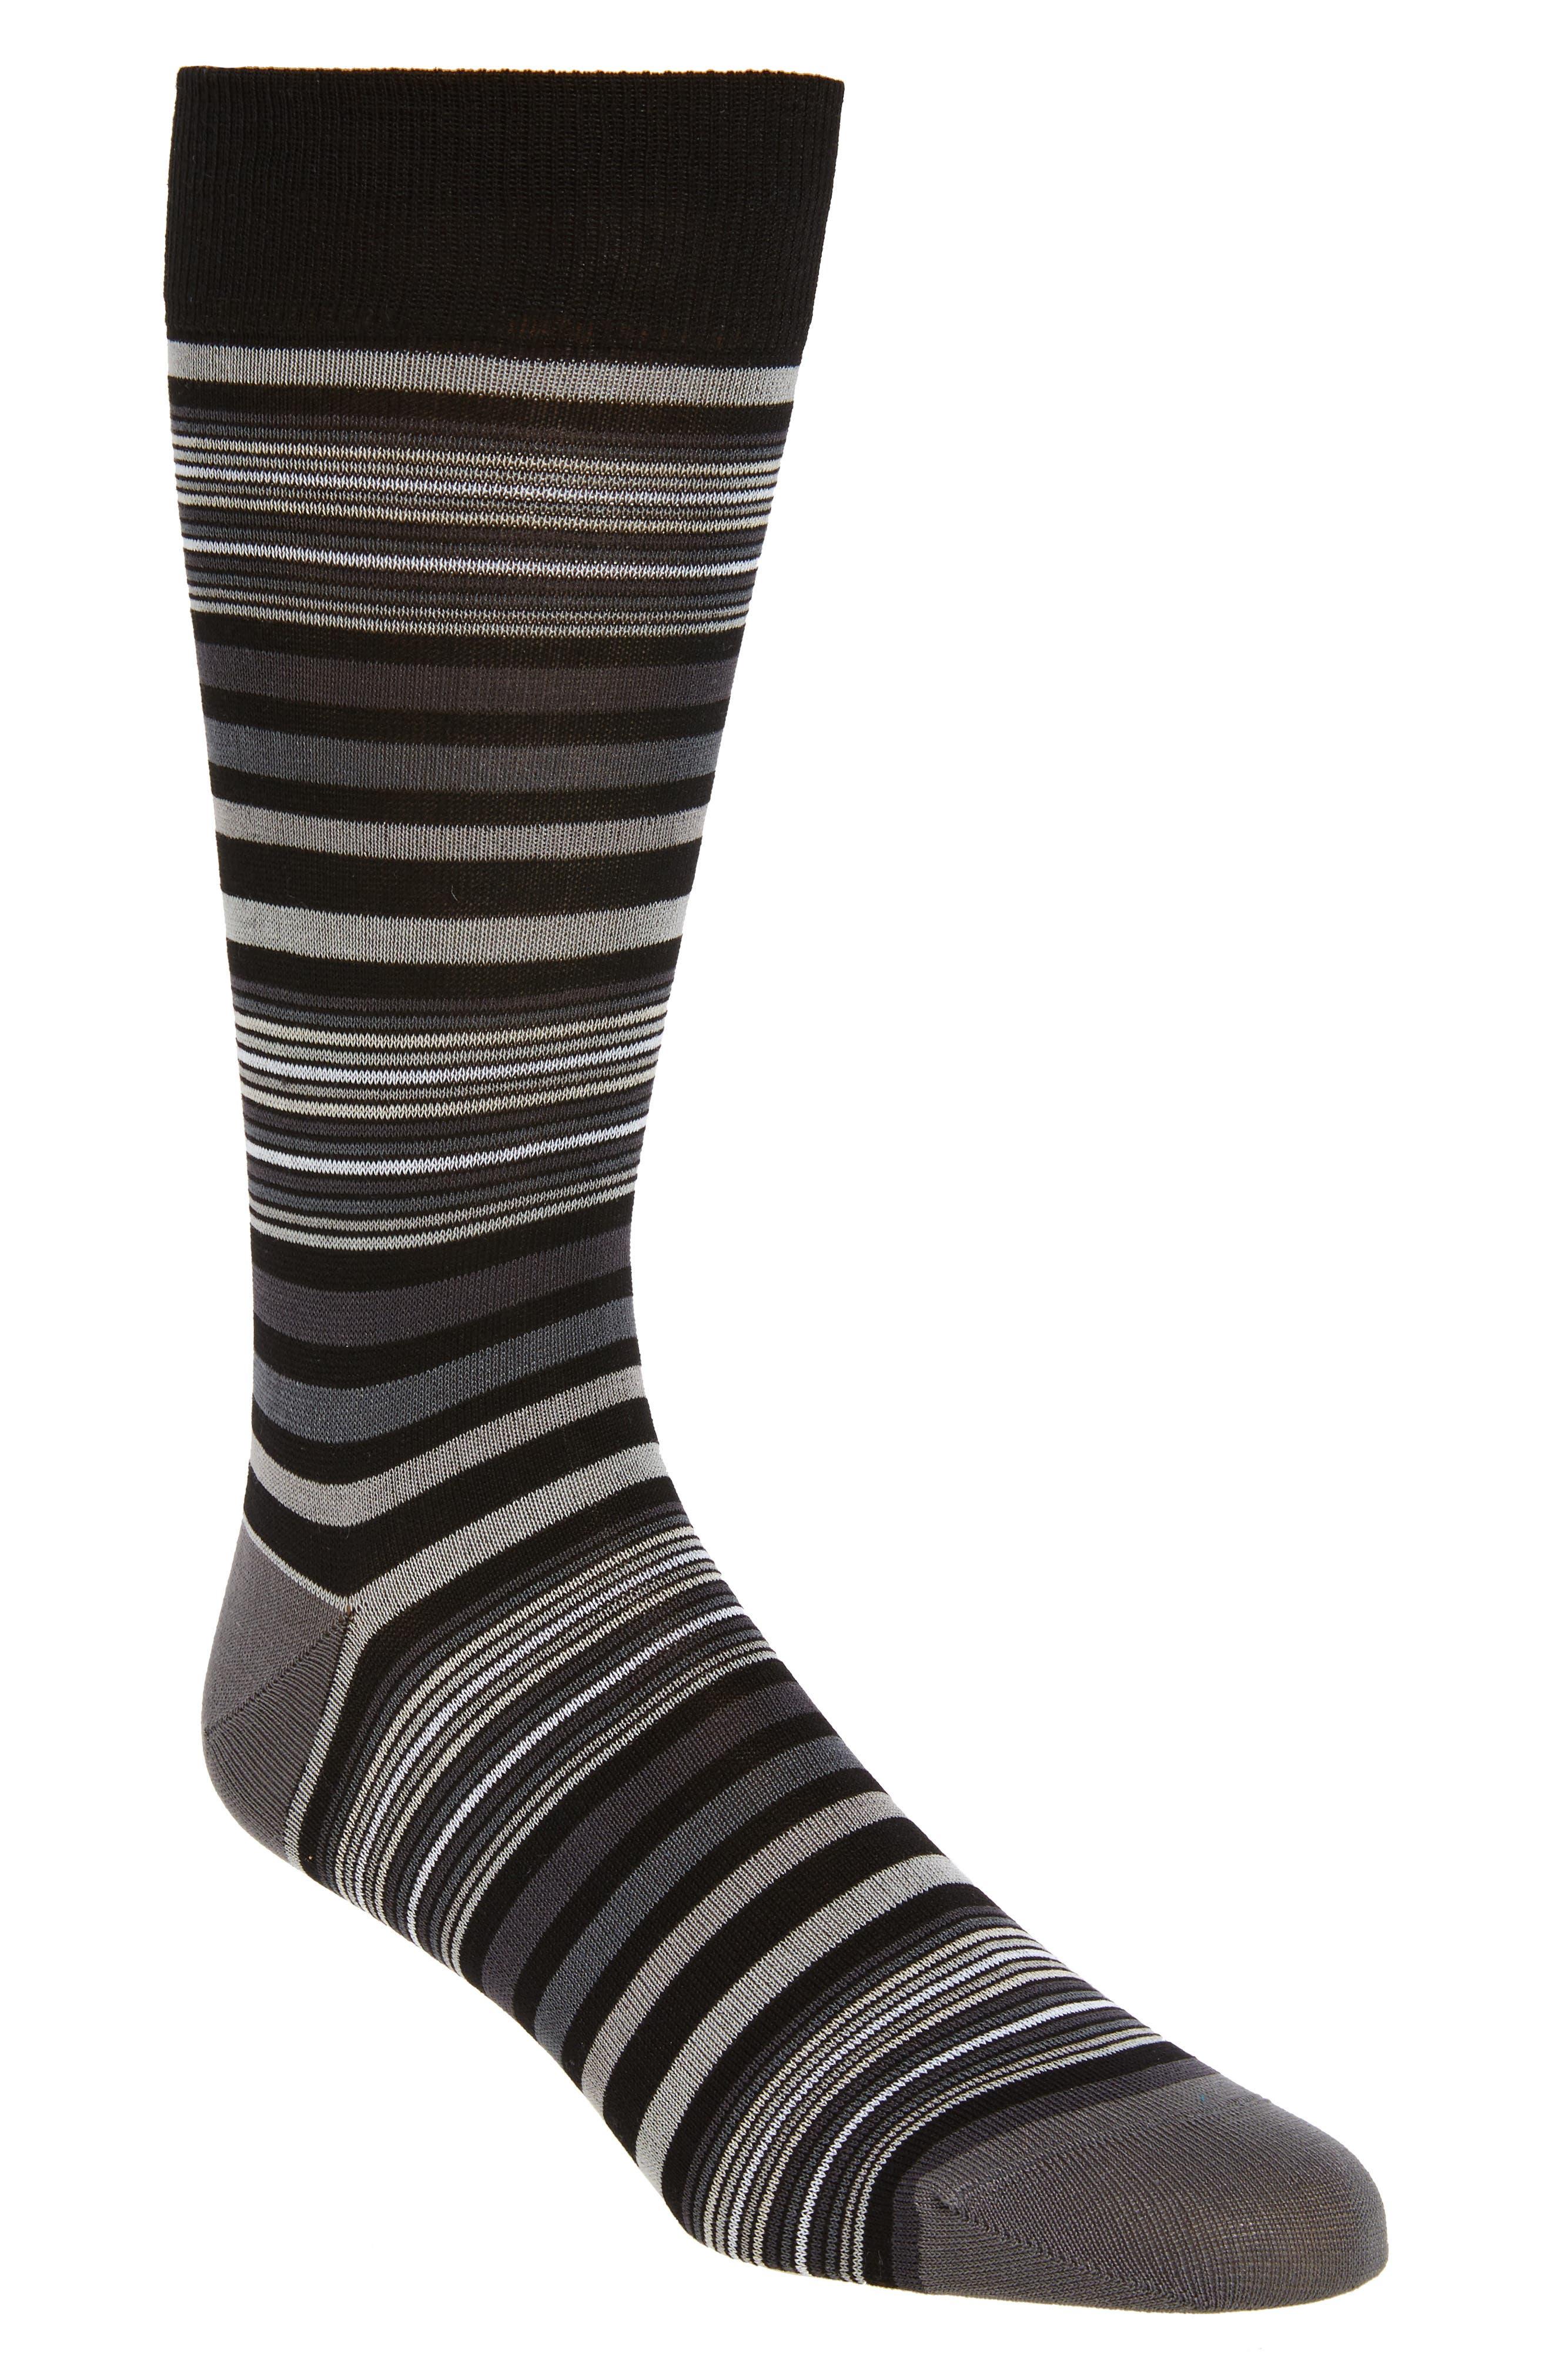 Main Image - Bugatchi Thin Stripe Crew Socks